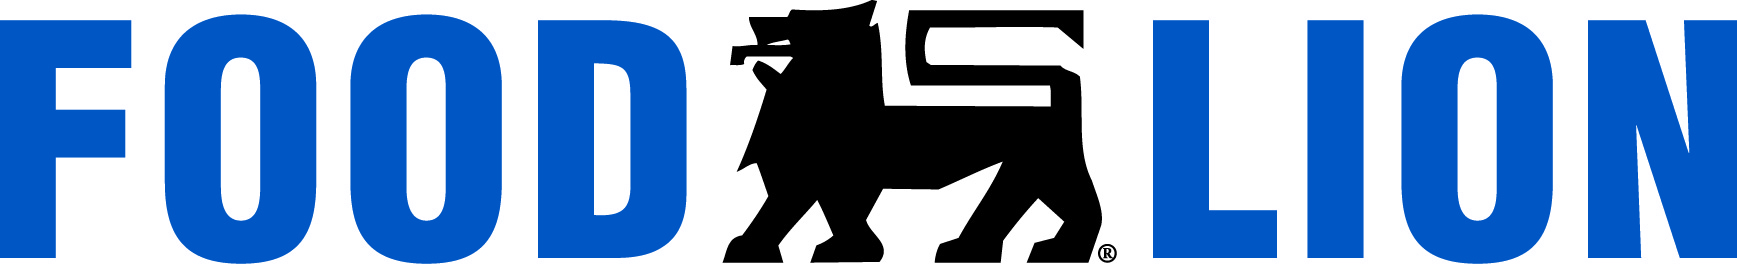 FoodLion_Logotype_Horiz_CMYK-2.JPG